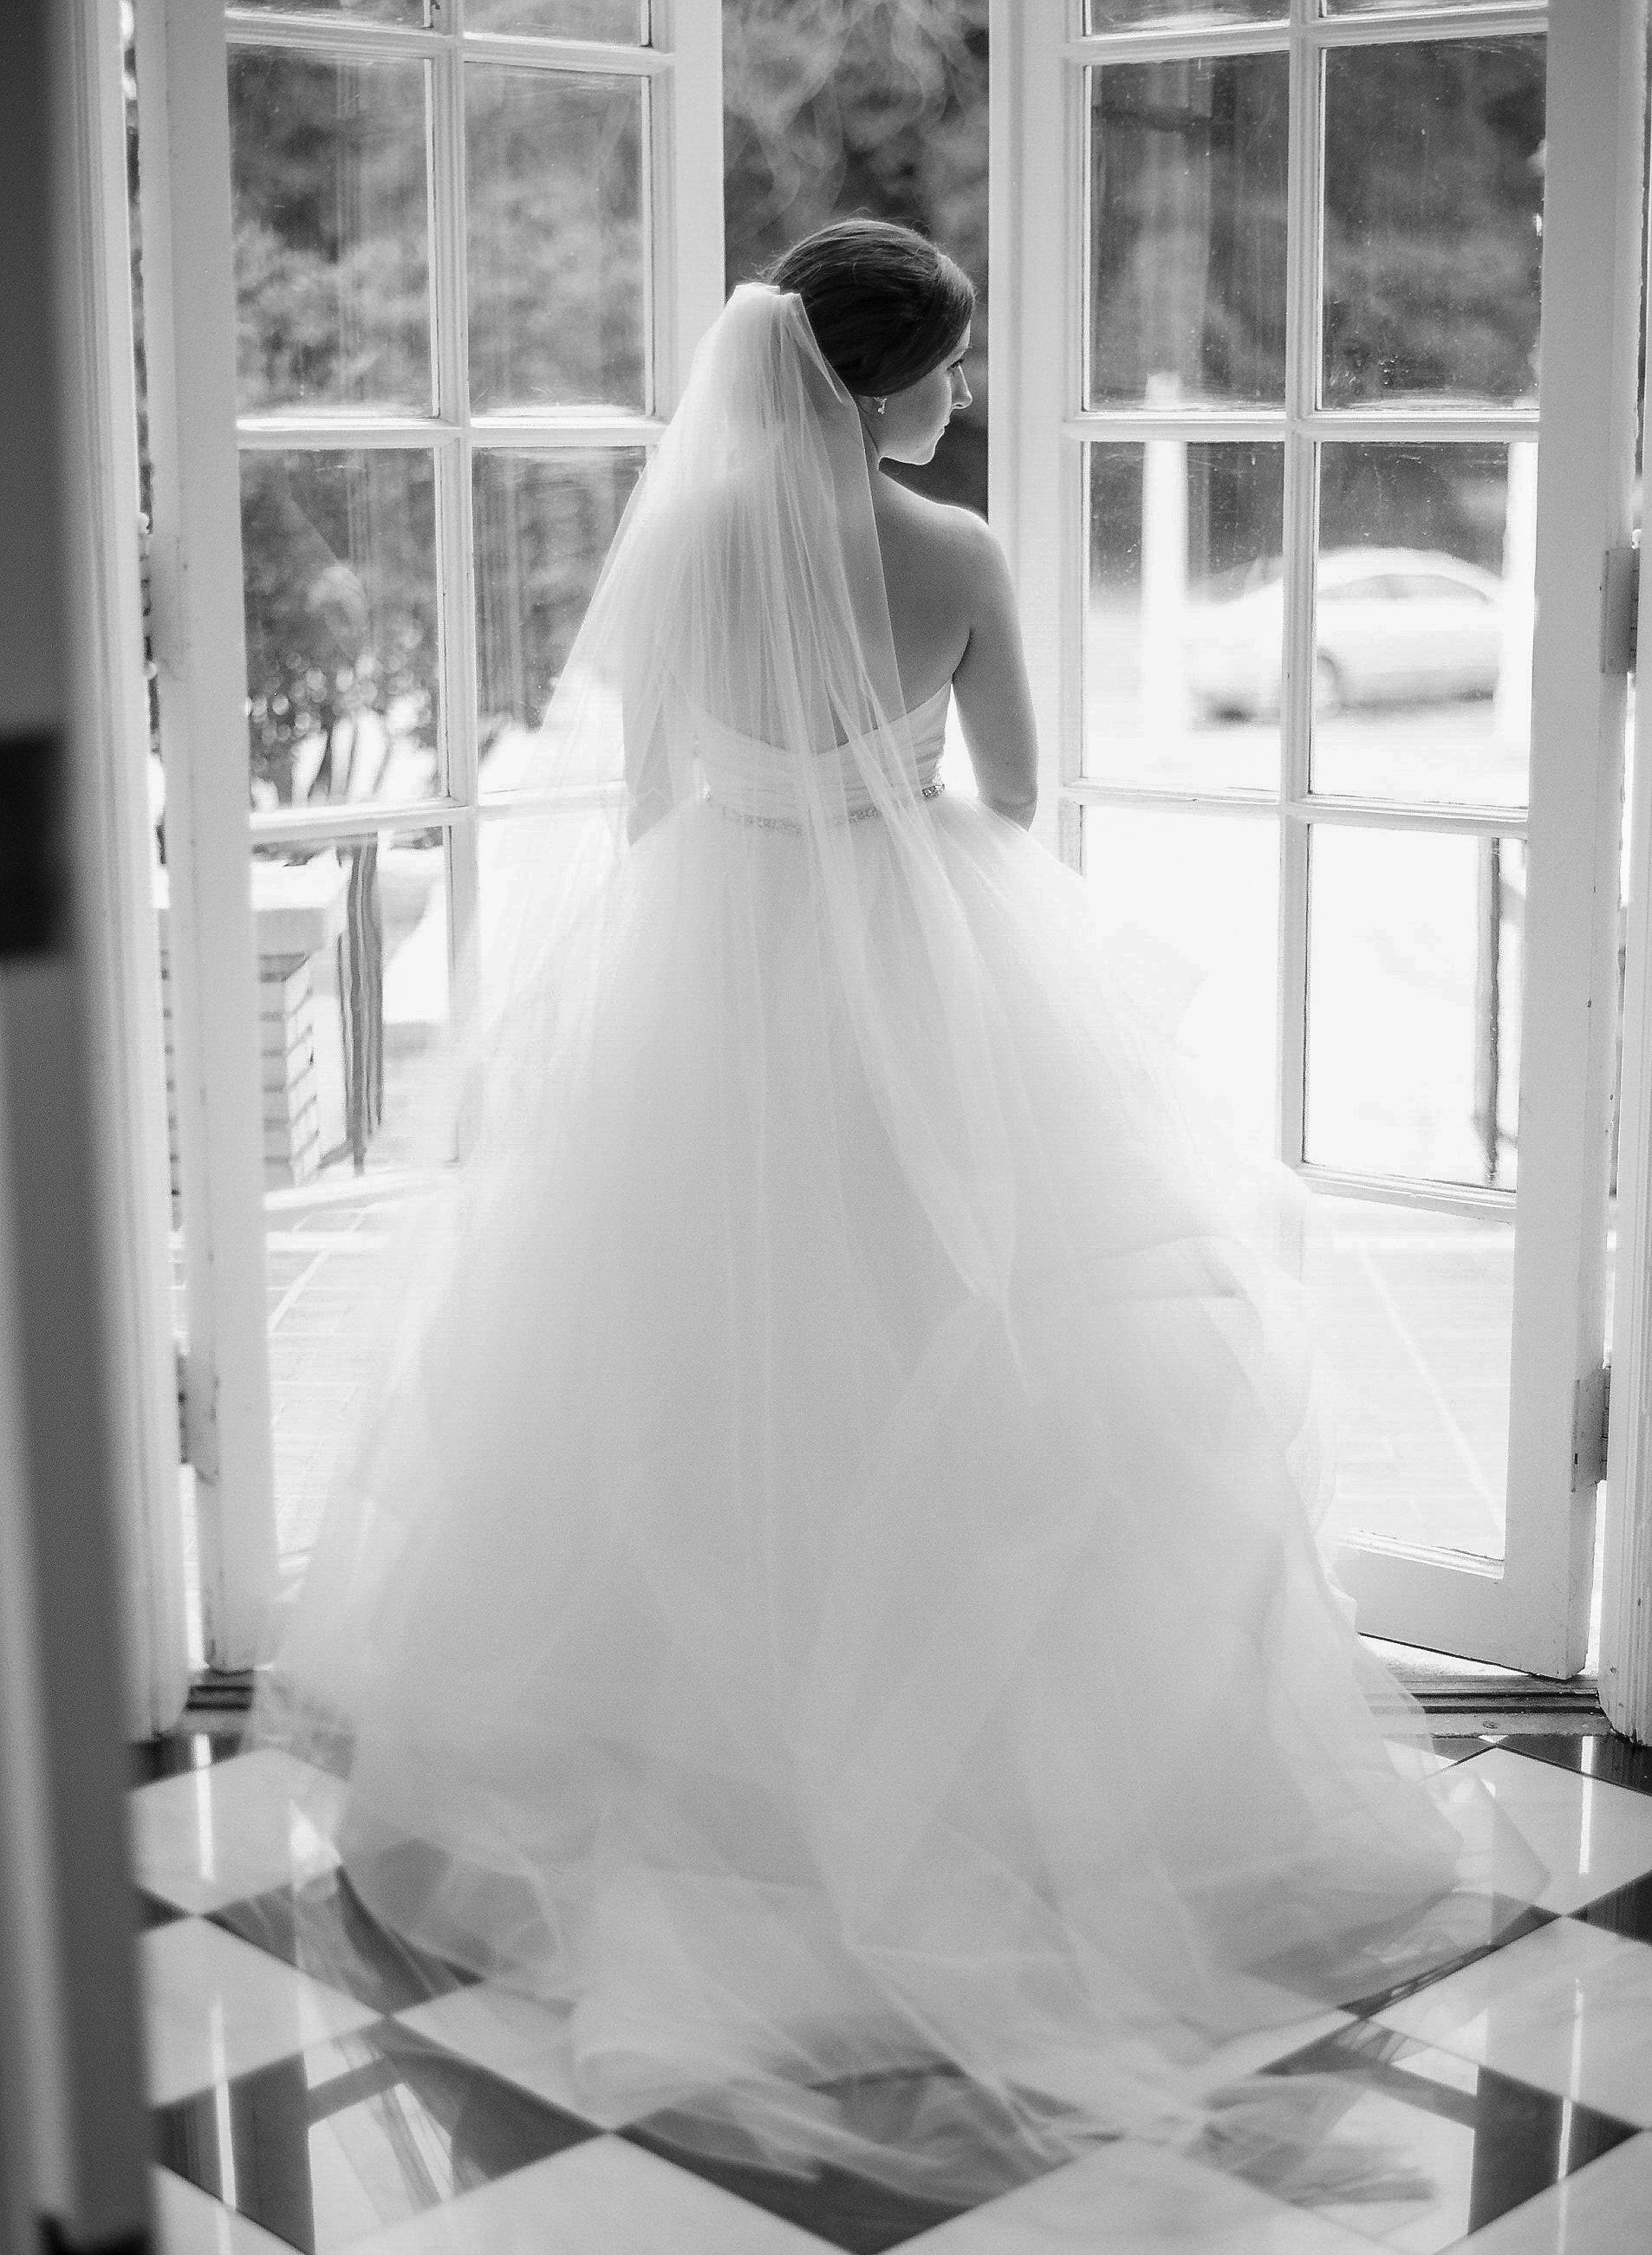 North-Carolina-Bridal-Photographer-Rebecca-7.jpg